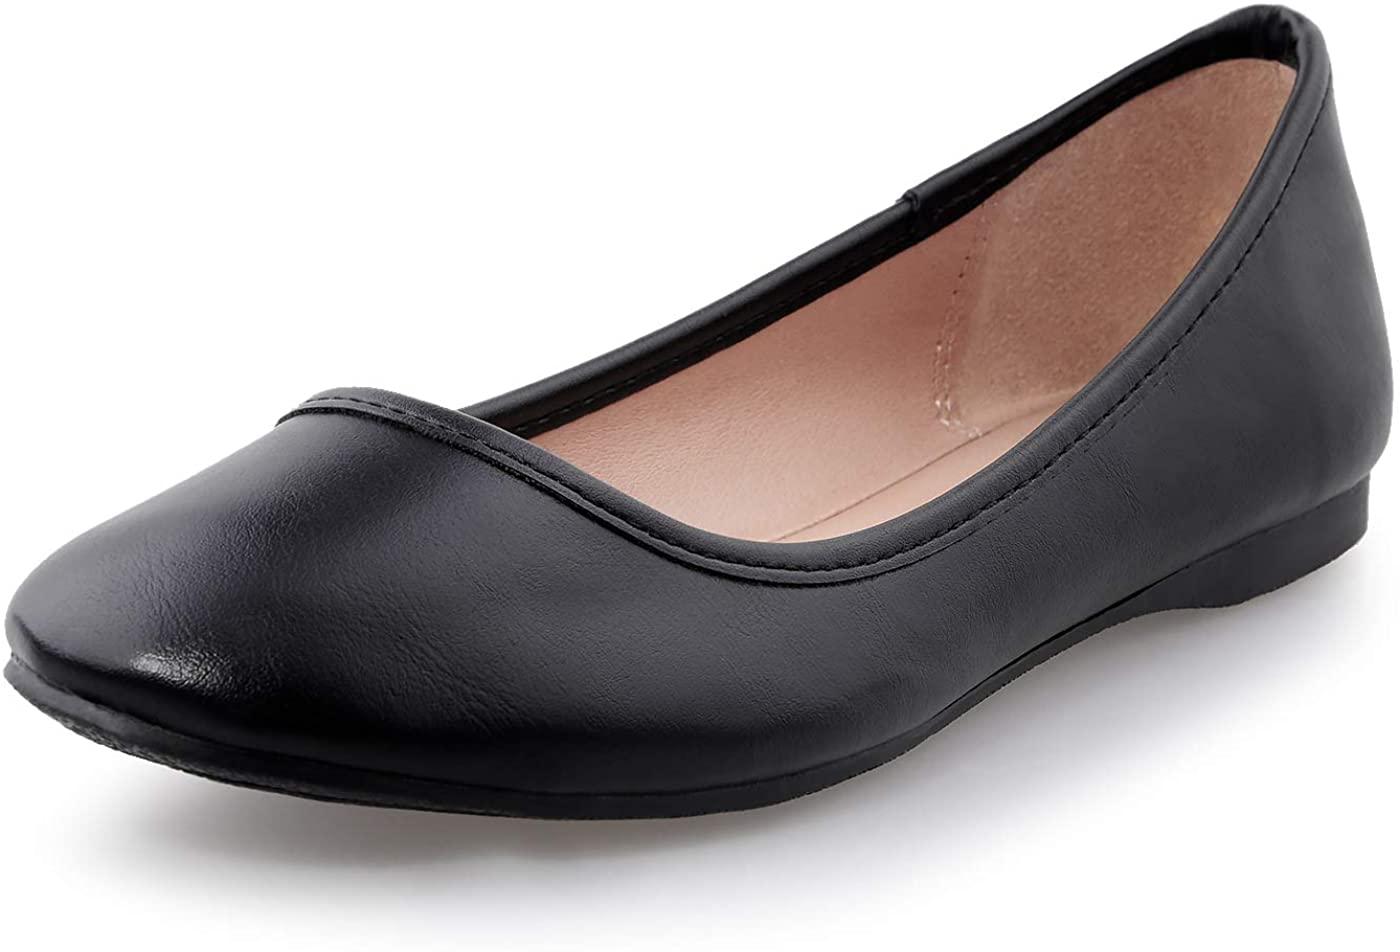 shoeslocker Womens Ballet Flat Shoes Ladies Flats Anti-Slip Flat Shoes